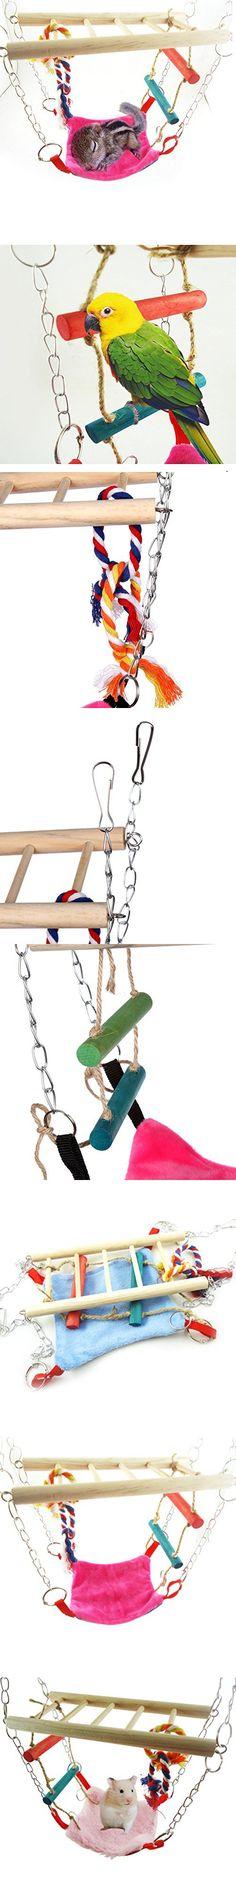 Bwogue Hamster Toys,Small Animals Parrot Hammock Climber Ladder Color Random